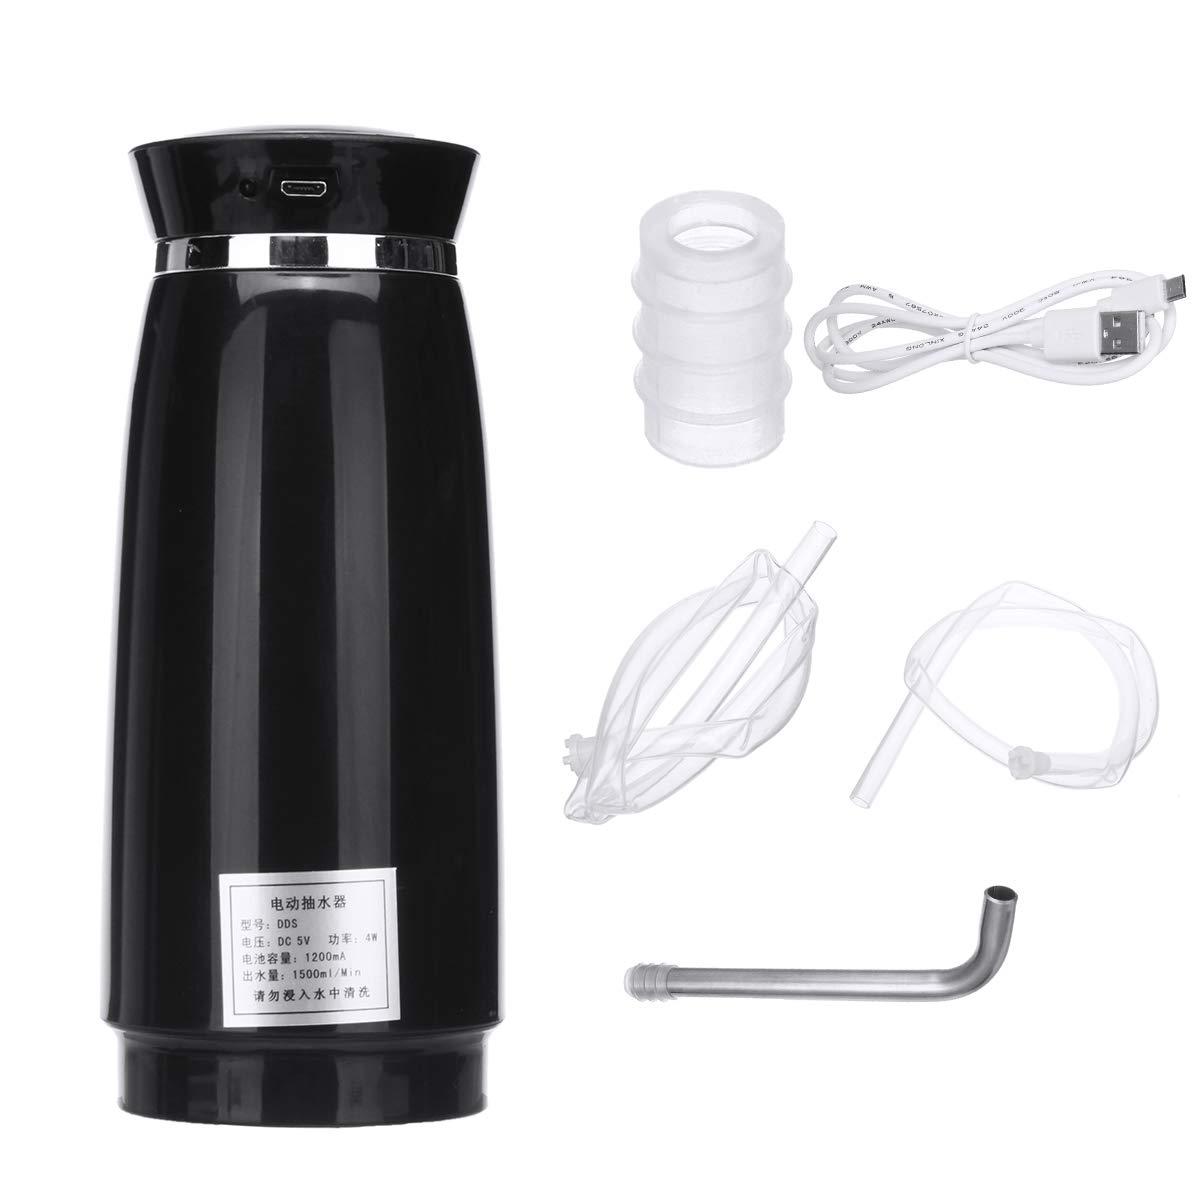 SAFETYON Automatic Drinking Water Pump Portable Water Drinking Button Pump Dispenser Black